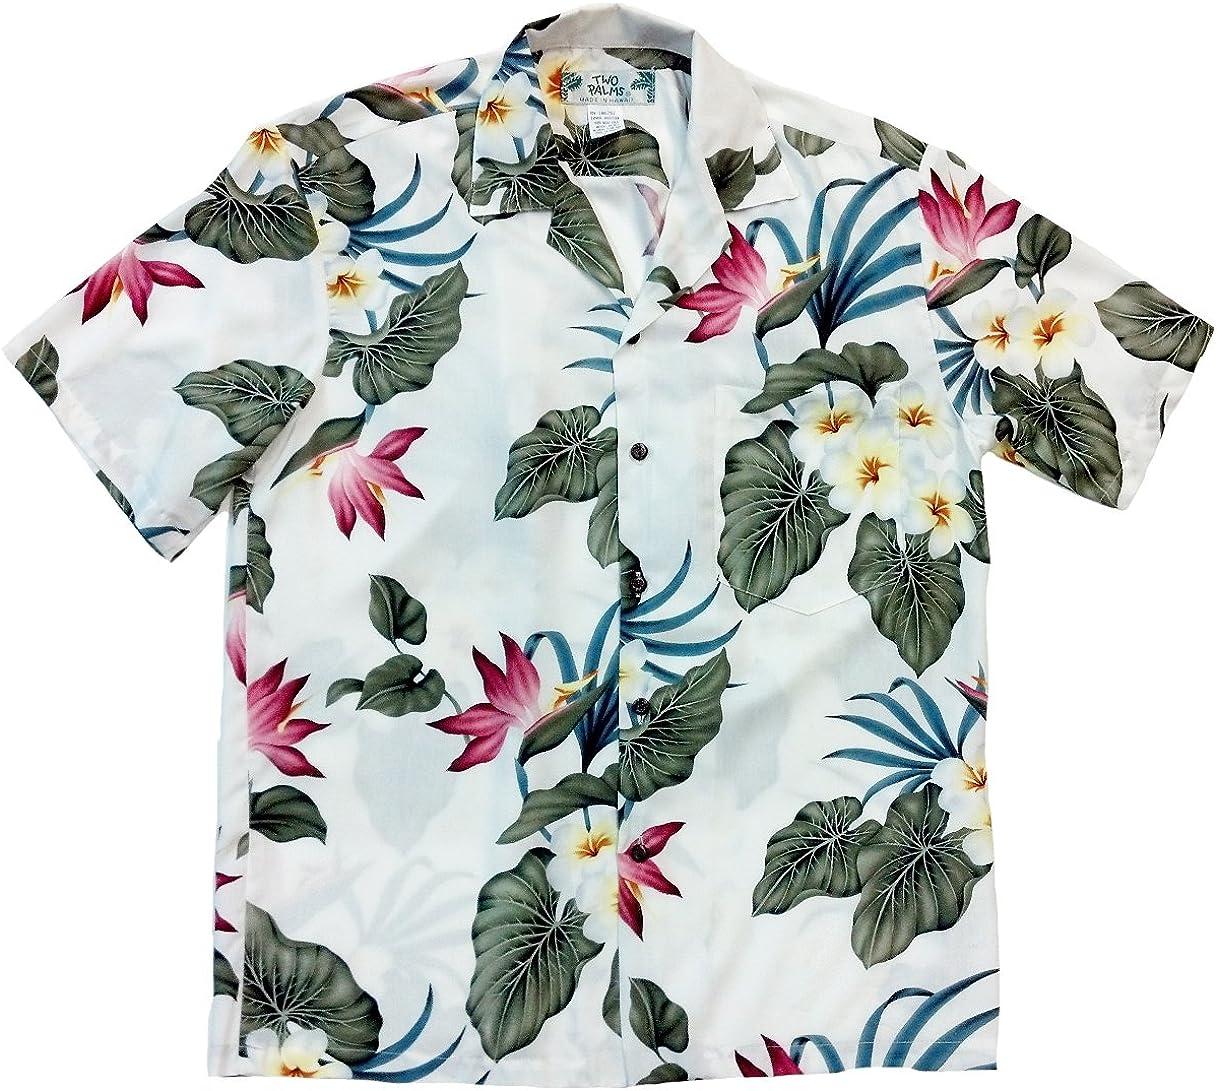 Two Palms Men's Retro Paradise Shirt